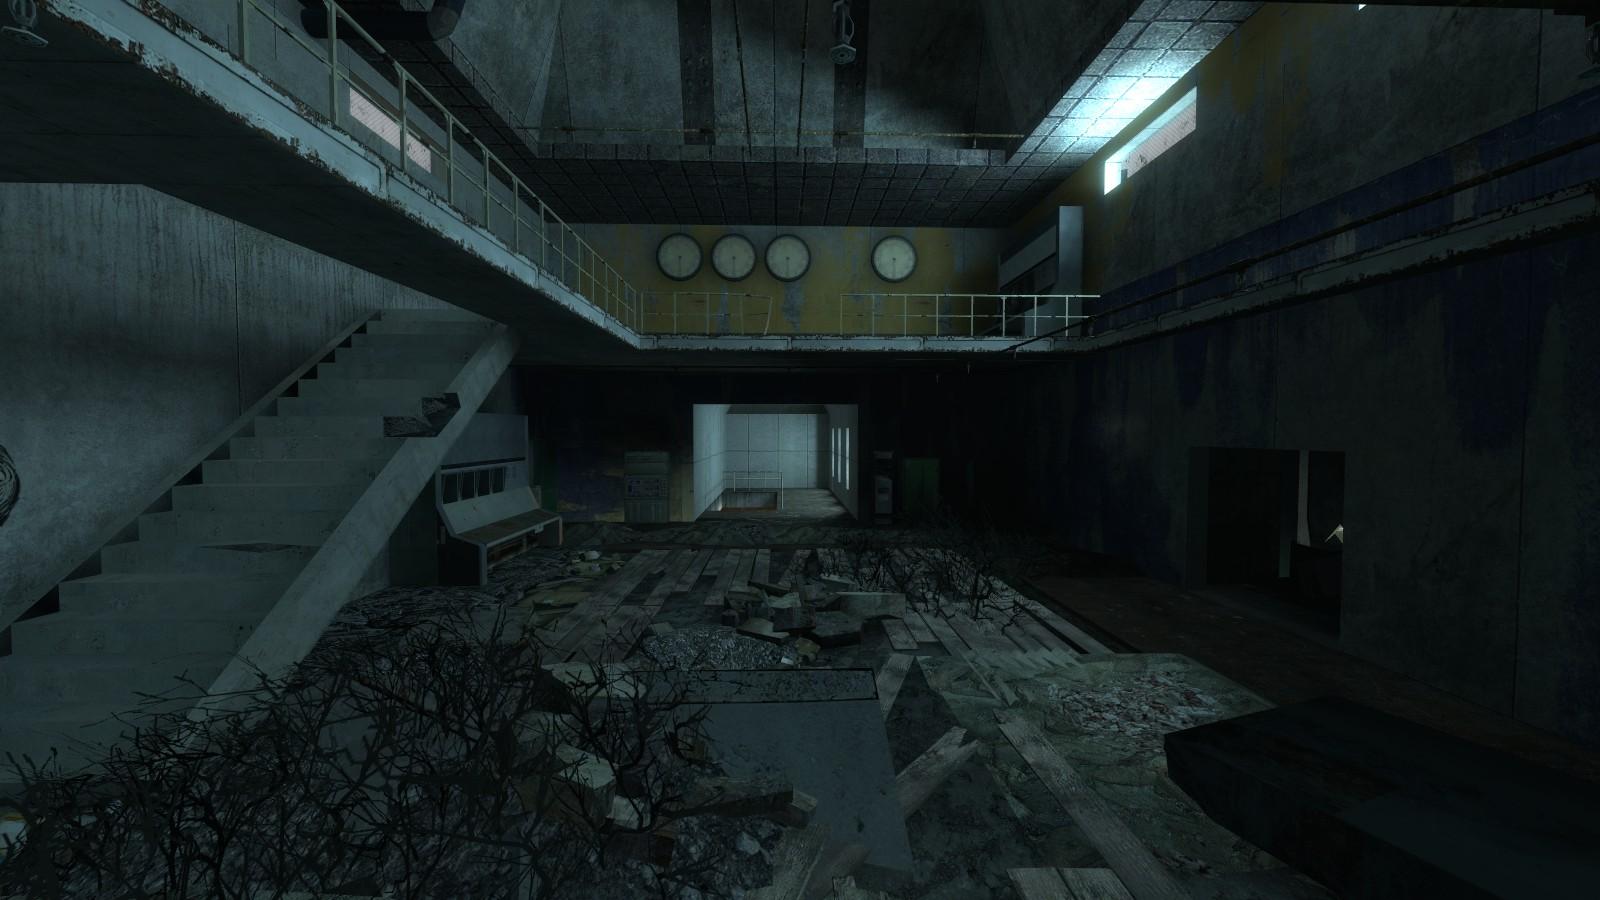 Half-Life 2. Dark Interval [MOD] - Half-Life 2 Арт, Мод